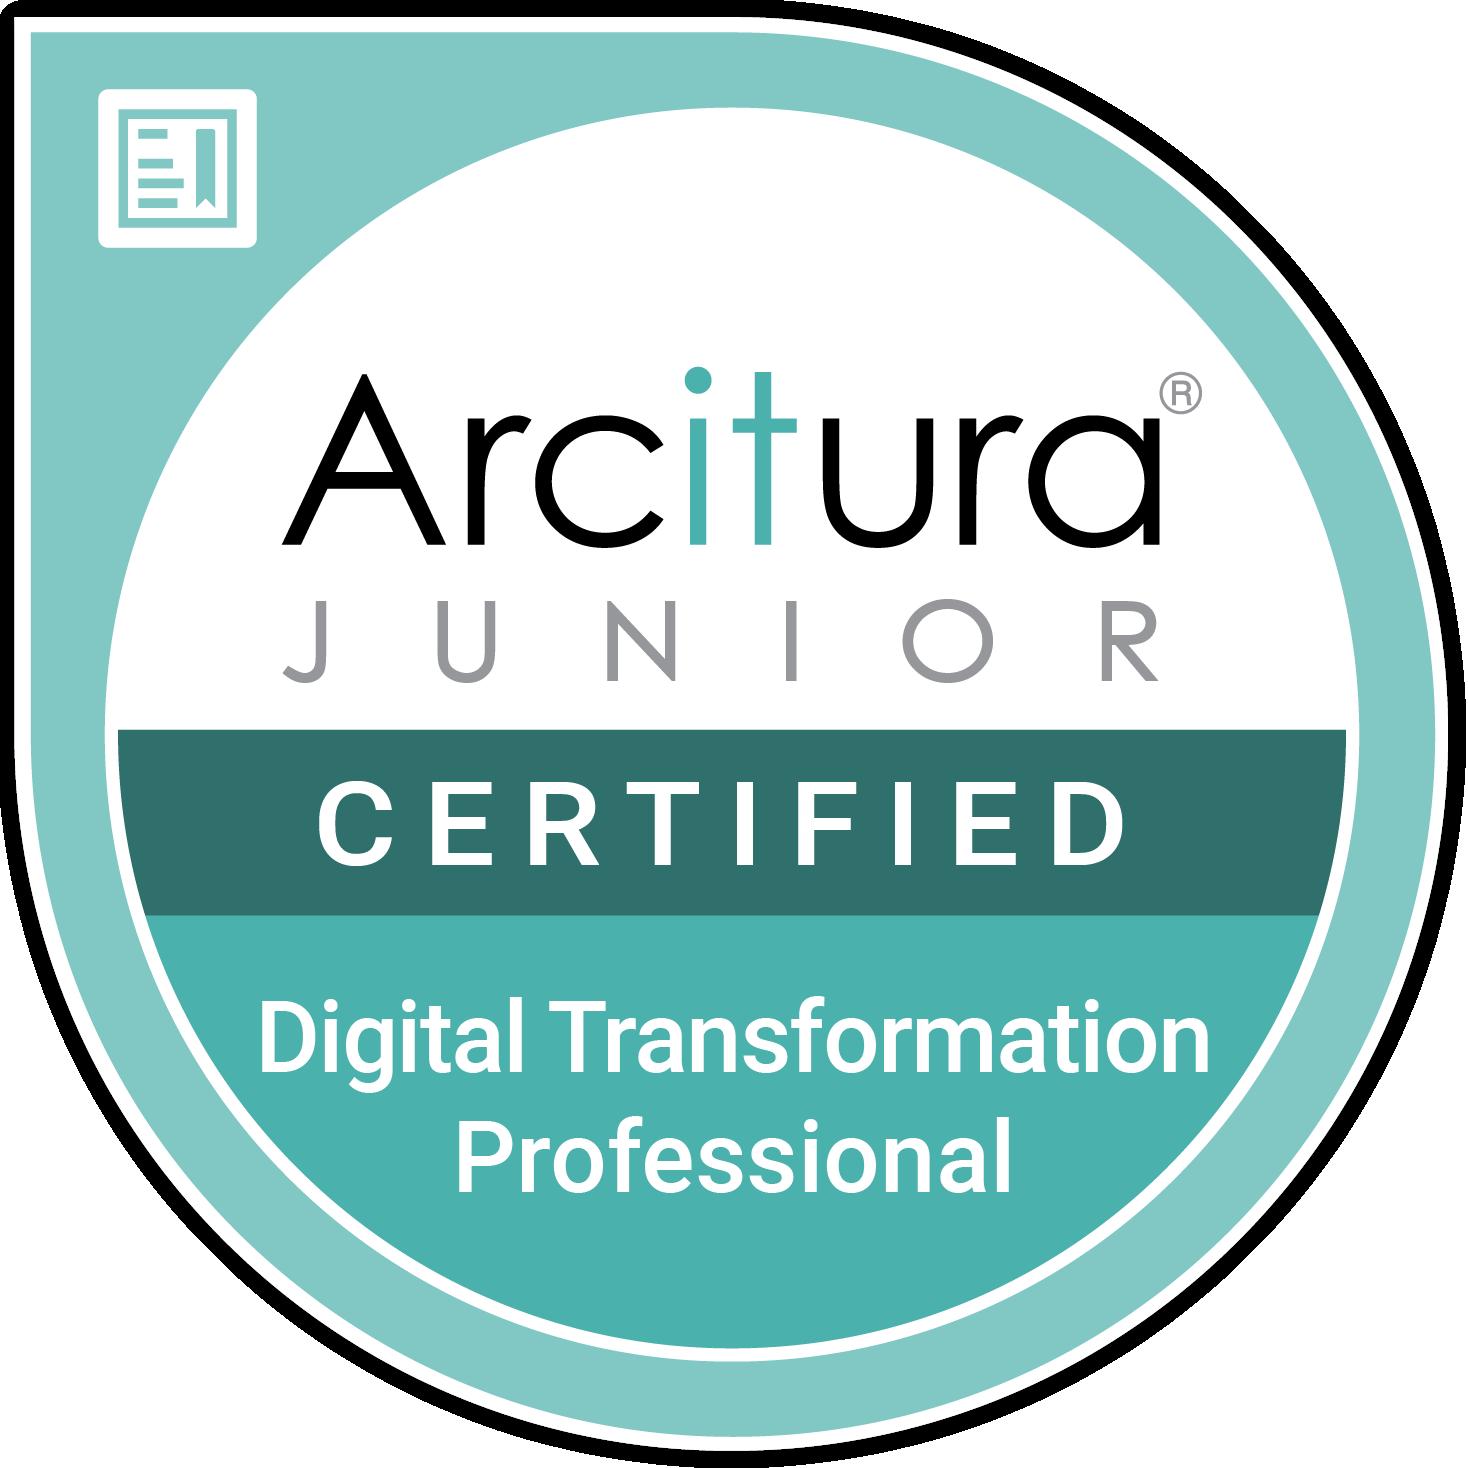 Junior Digital Transformation Professional